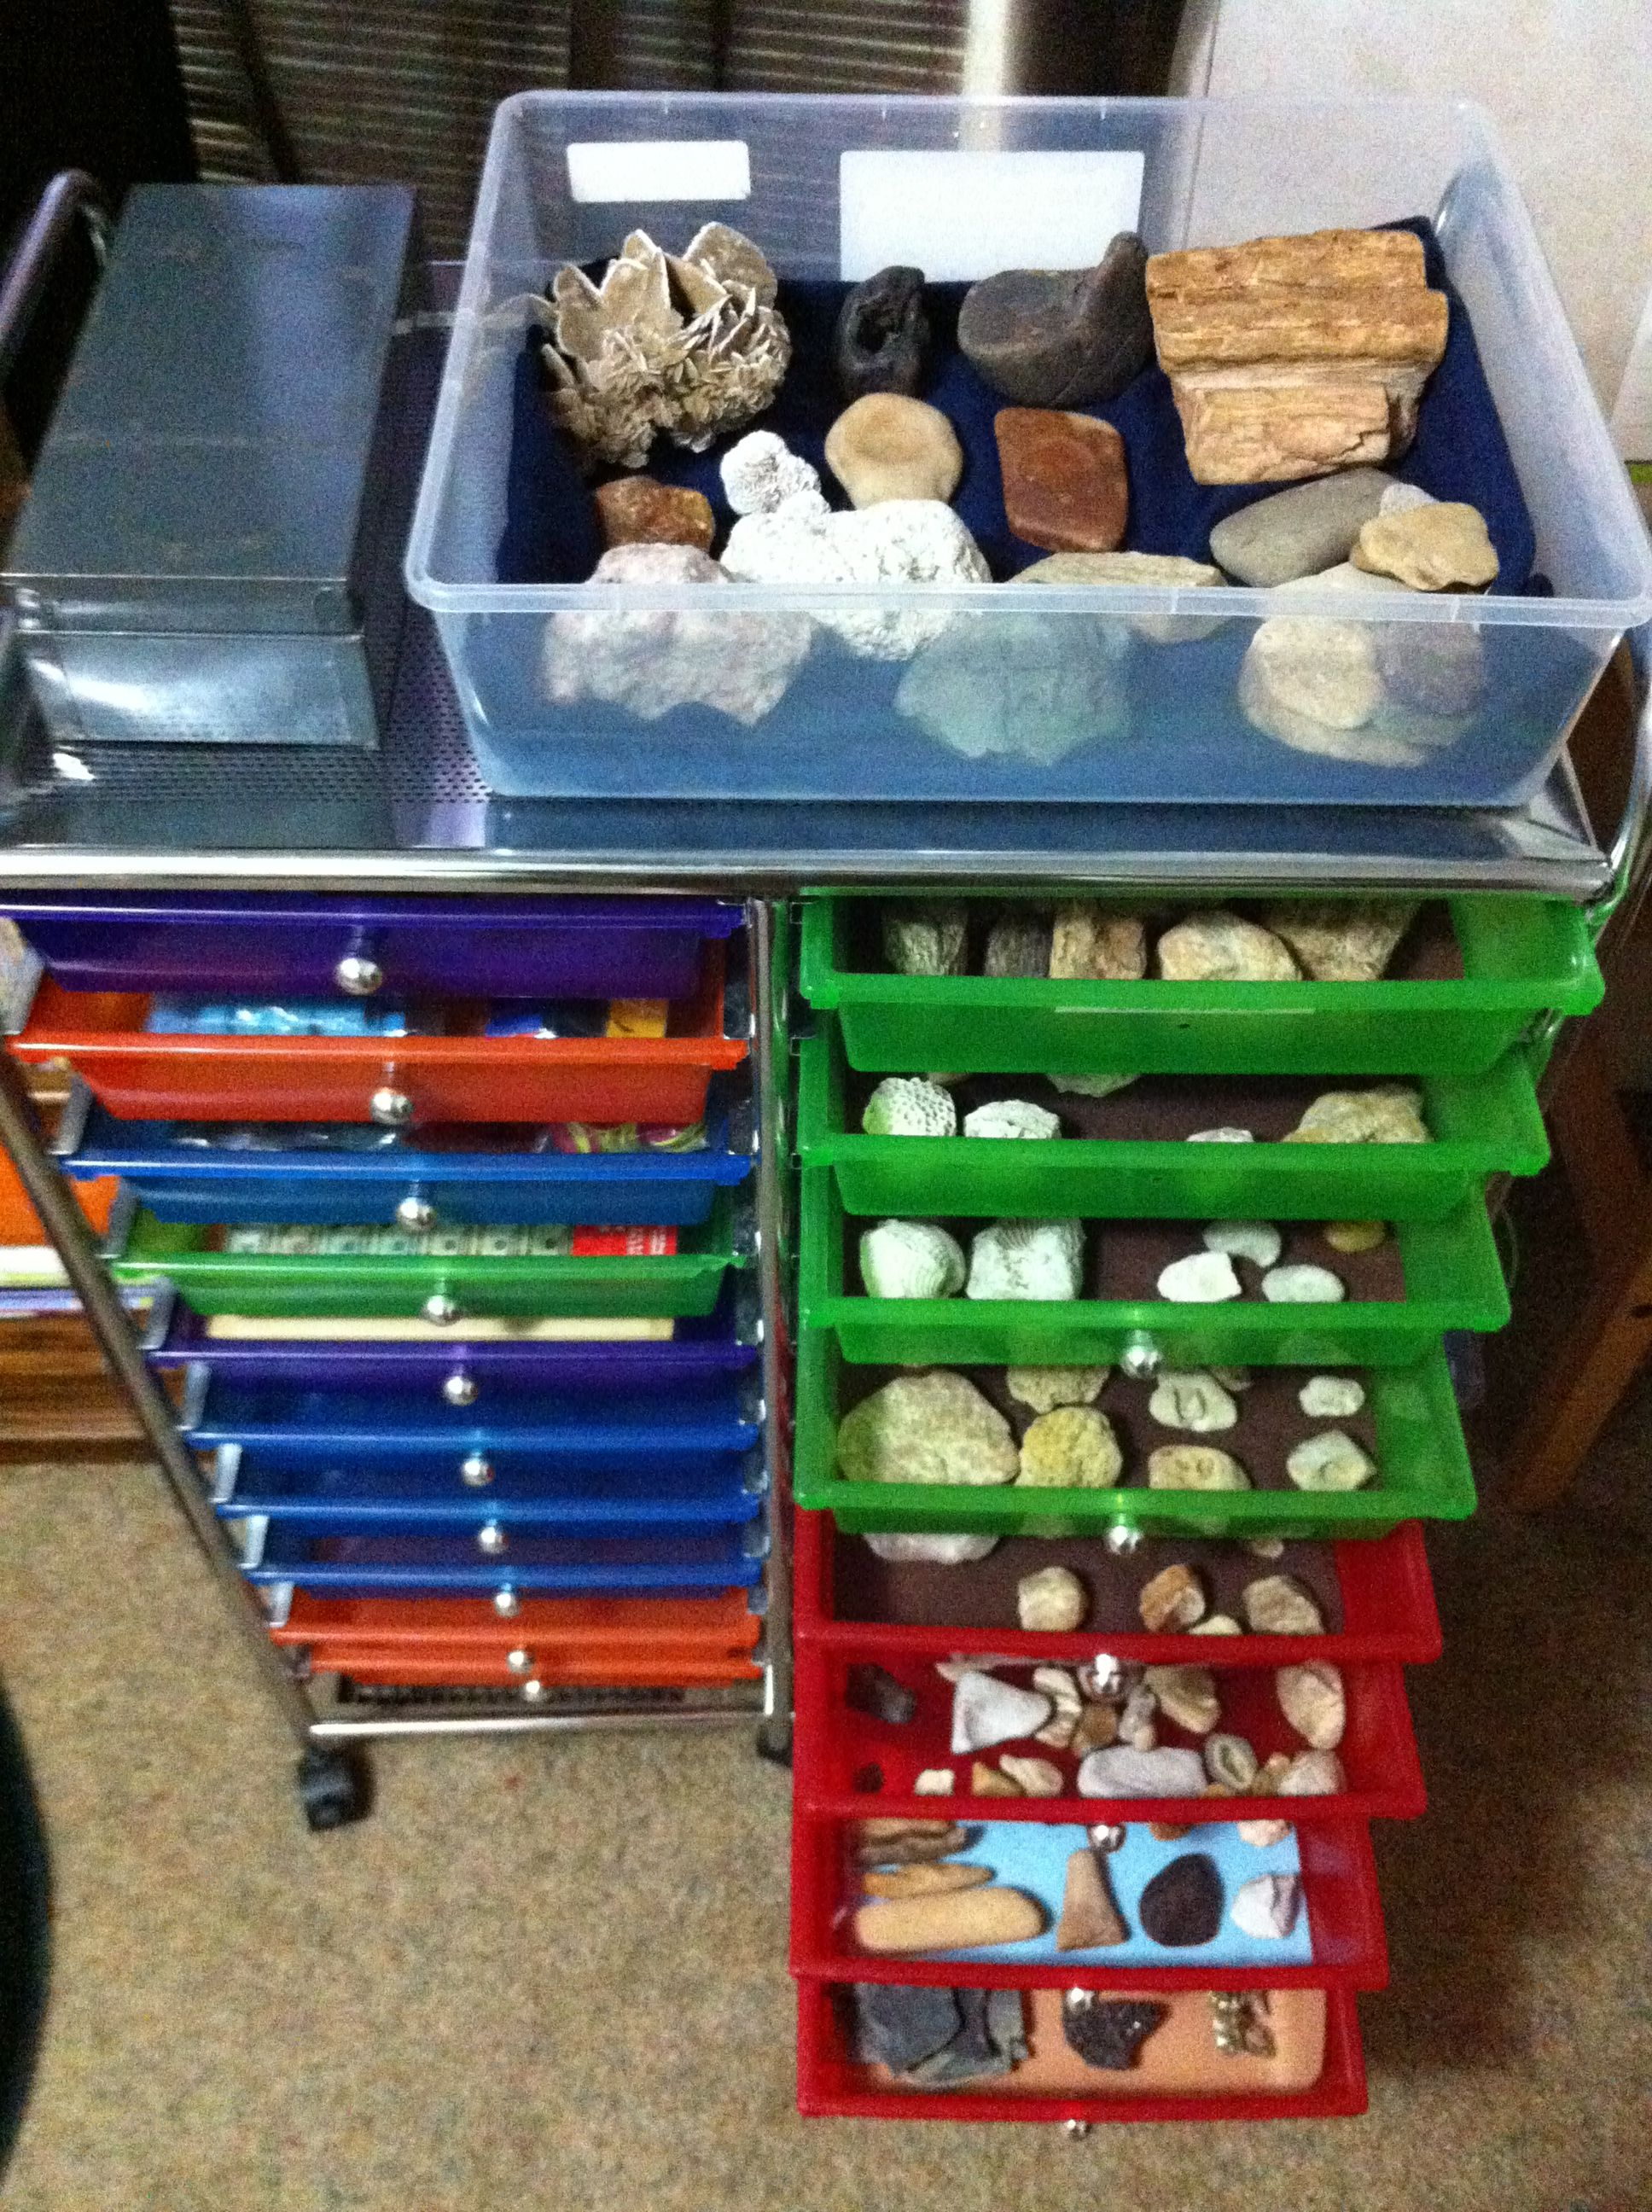 My New Rock Storage Storage And Organization Projects